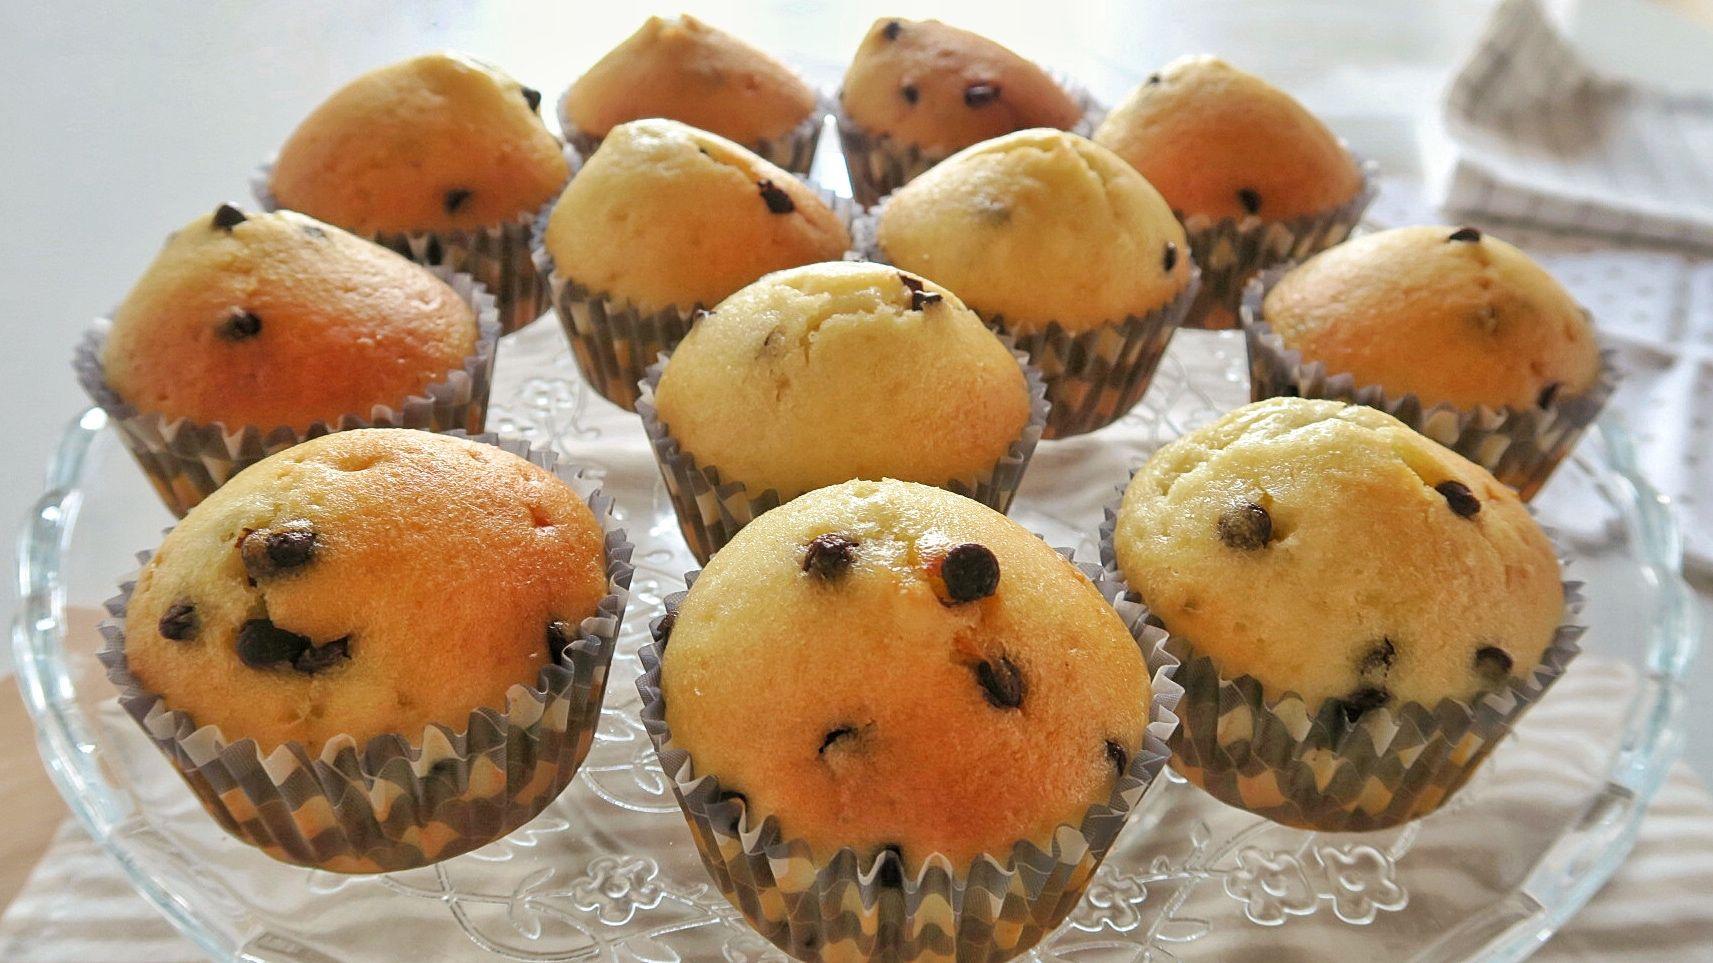 26fb9e76e3d0466fde9b0d847ca91ab2 - Ricette Muffin Yogurt